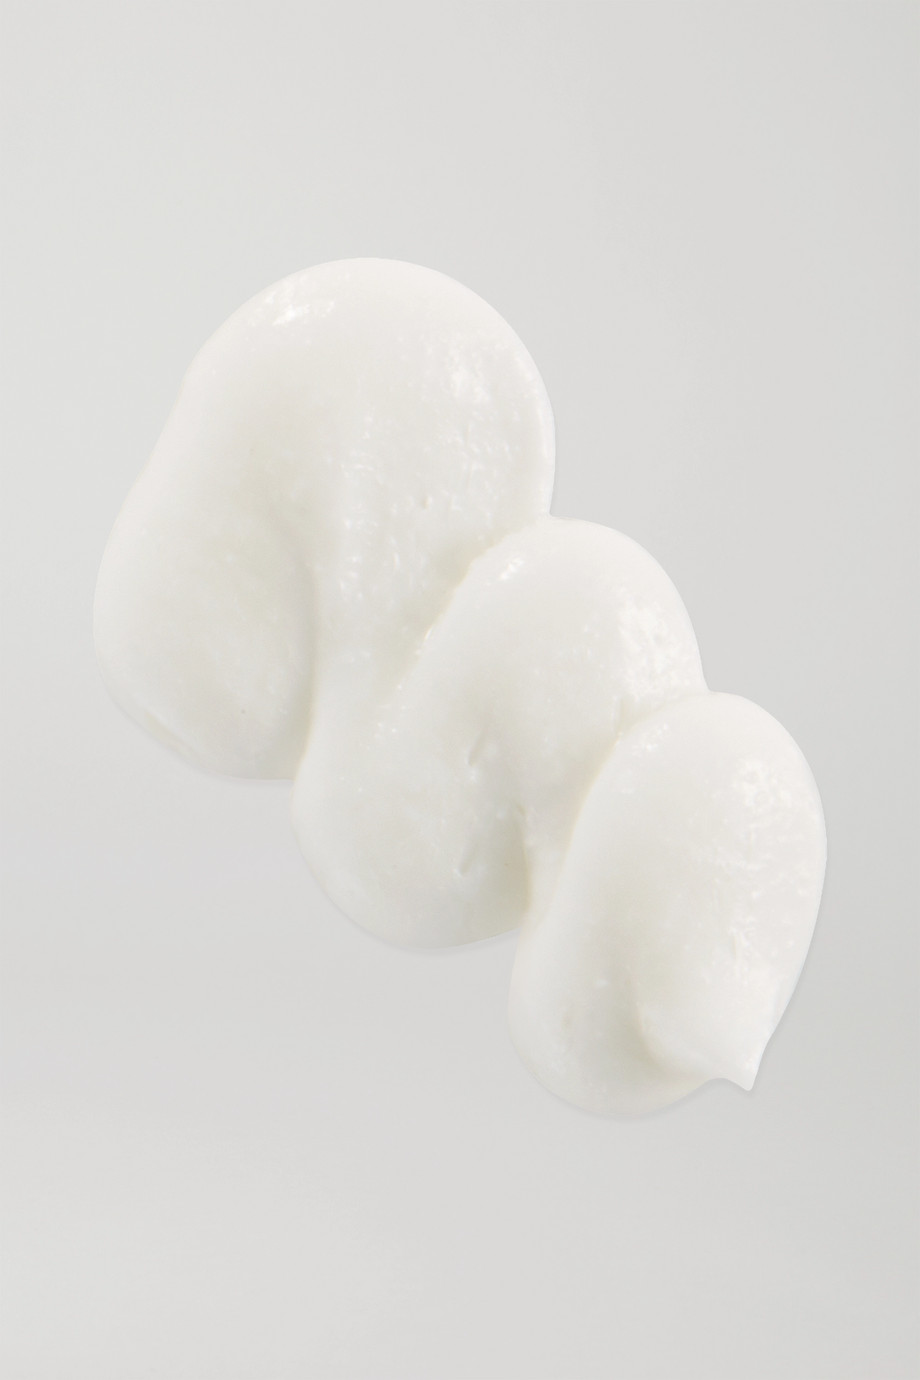 Cosmedix 竹萃亮白双效面膜,74g